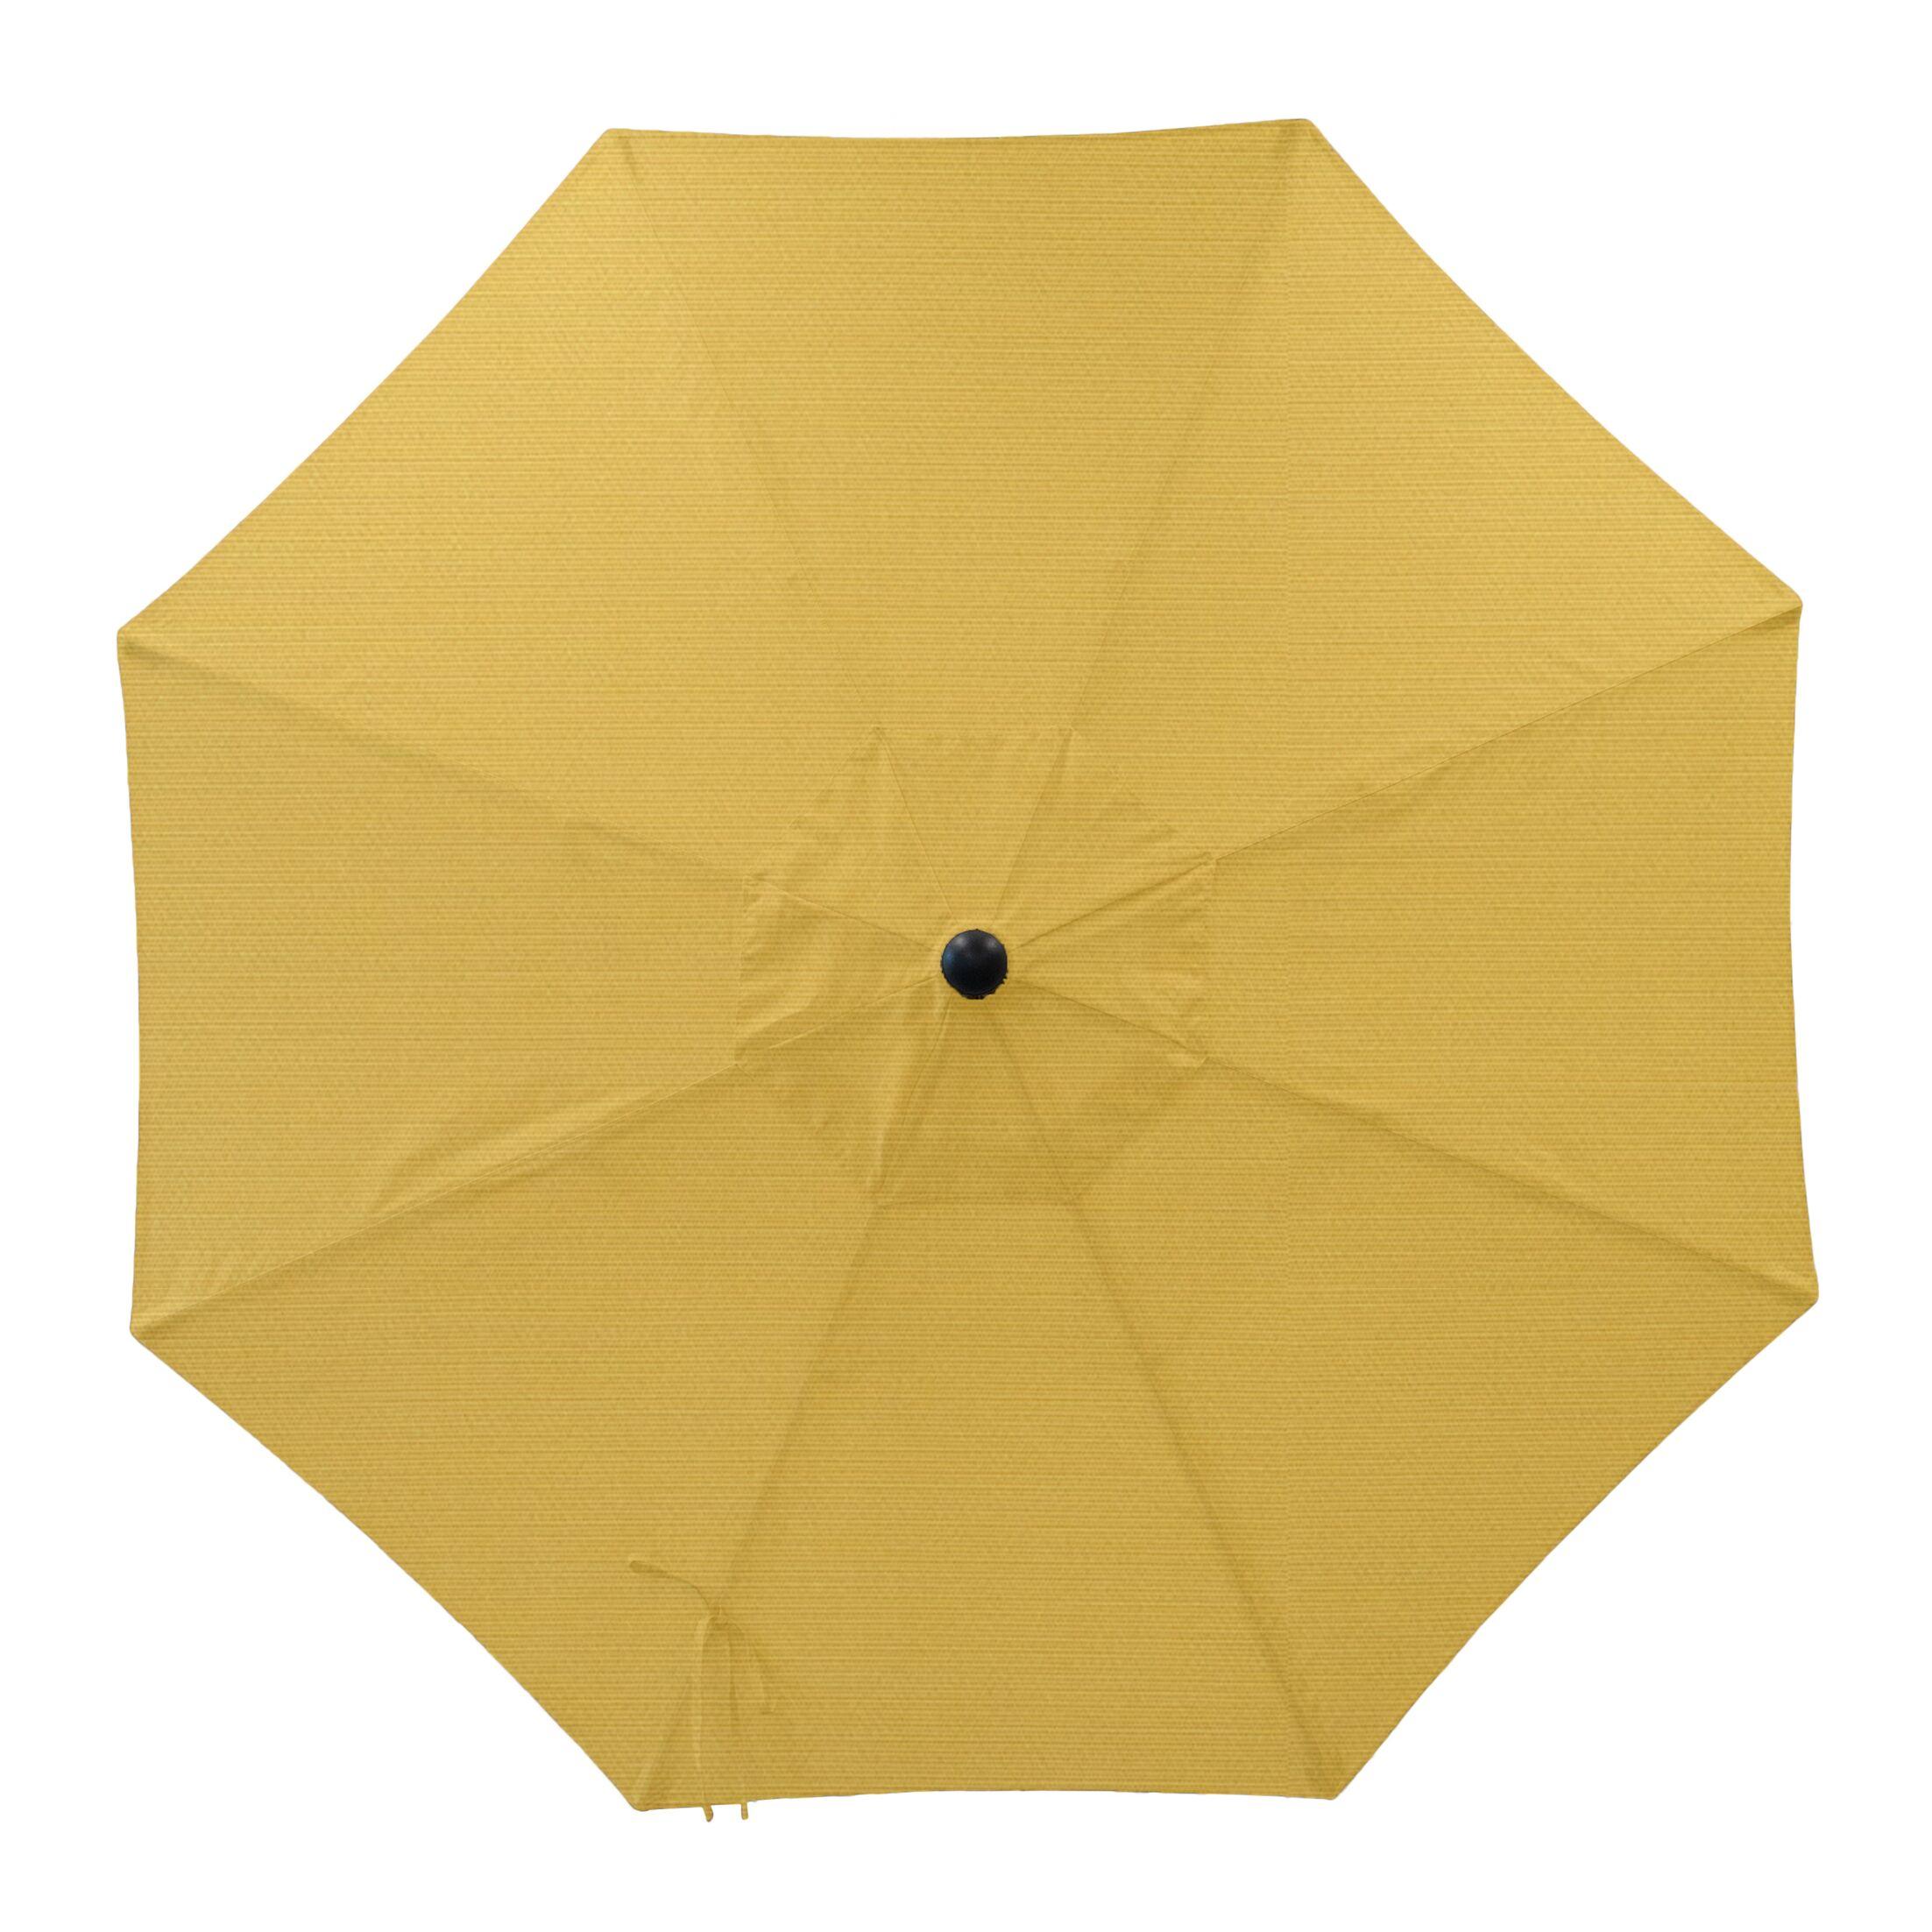 Centeno Double Pulley 9' Market Sunbrella Umbrella Frame Color: Silver Mirror, Fabric Color: Sunflower Yellow